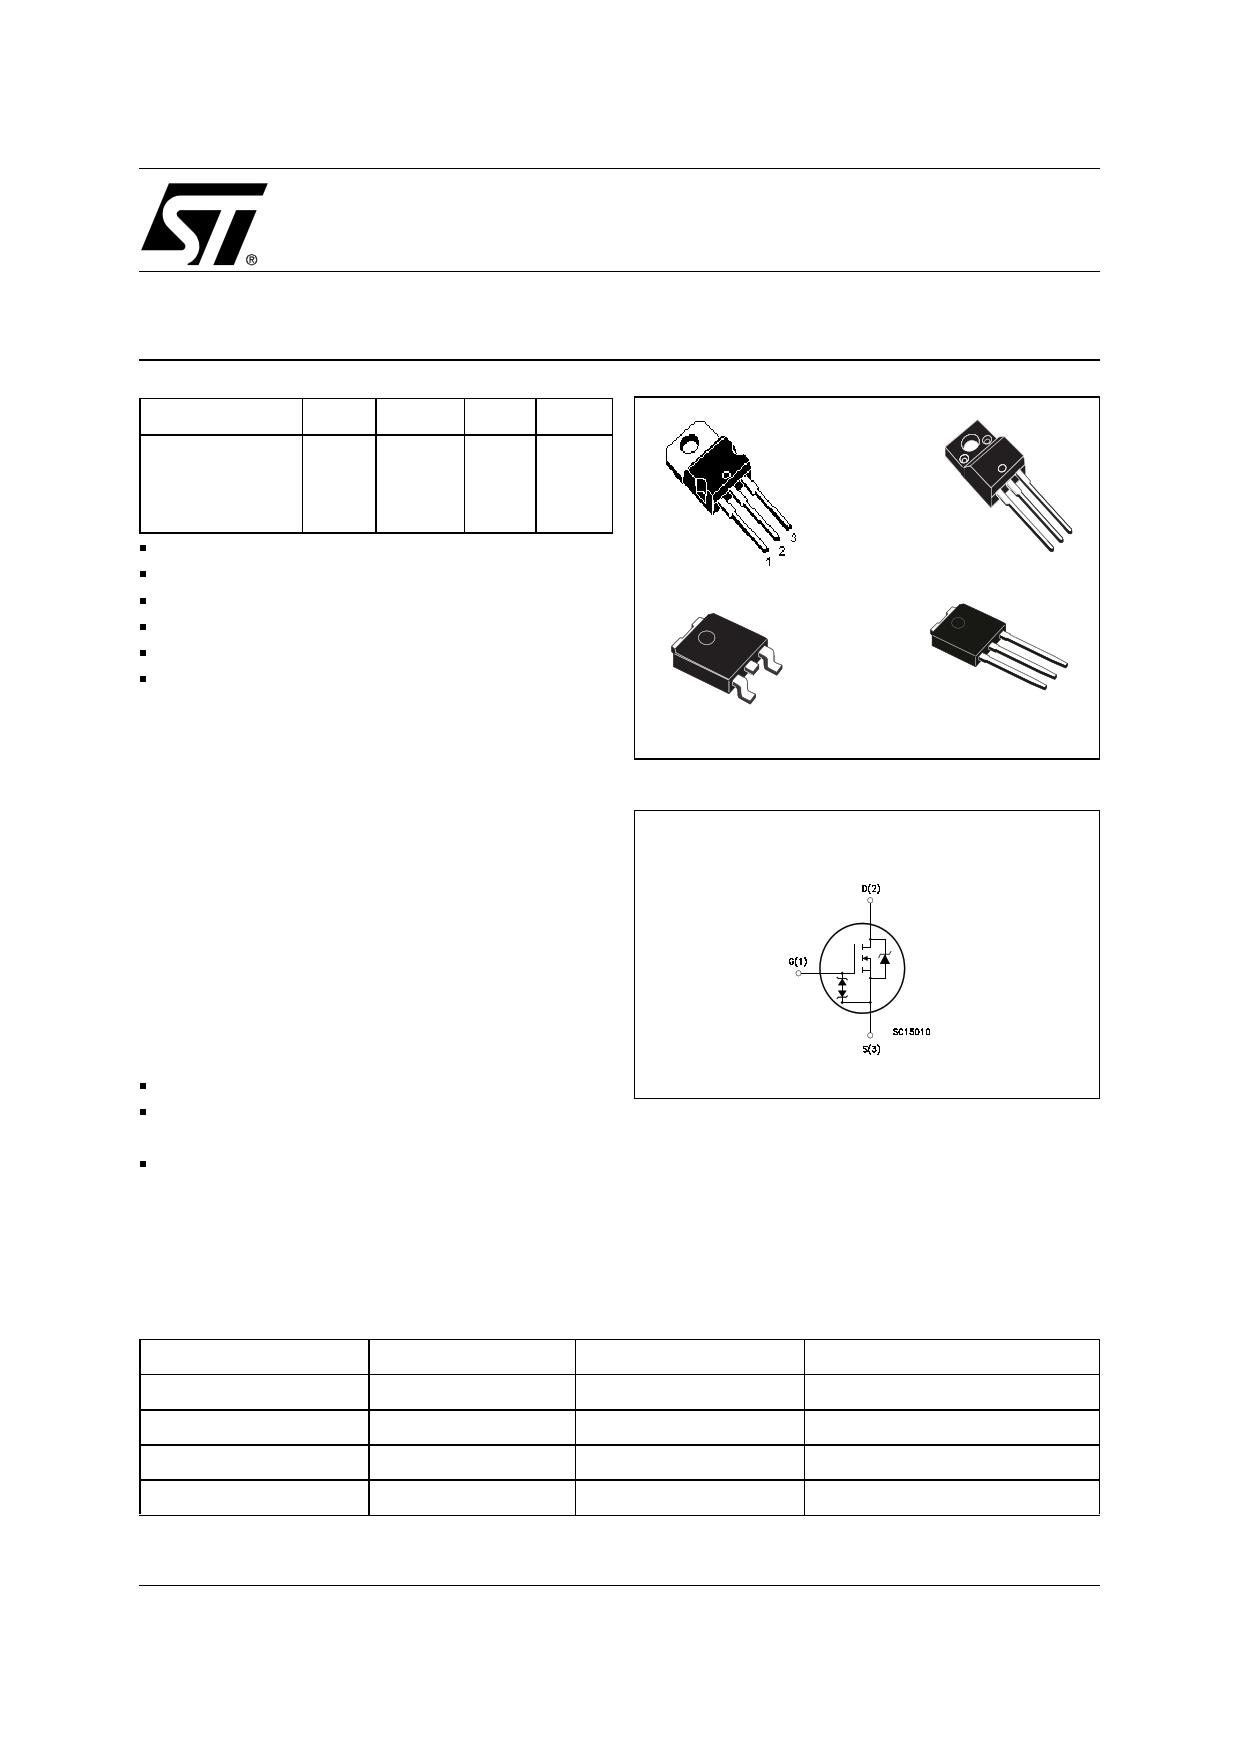 P3NK90Z datasheet